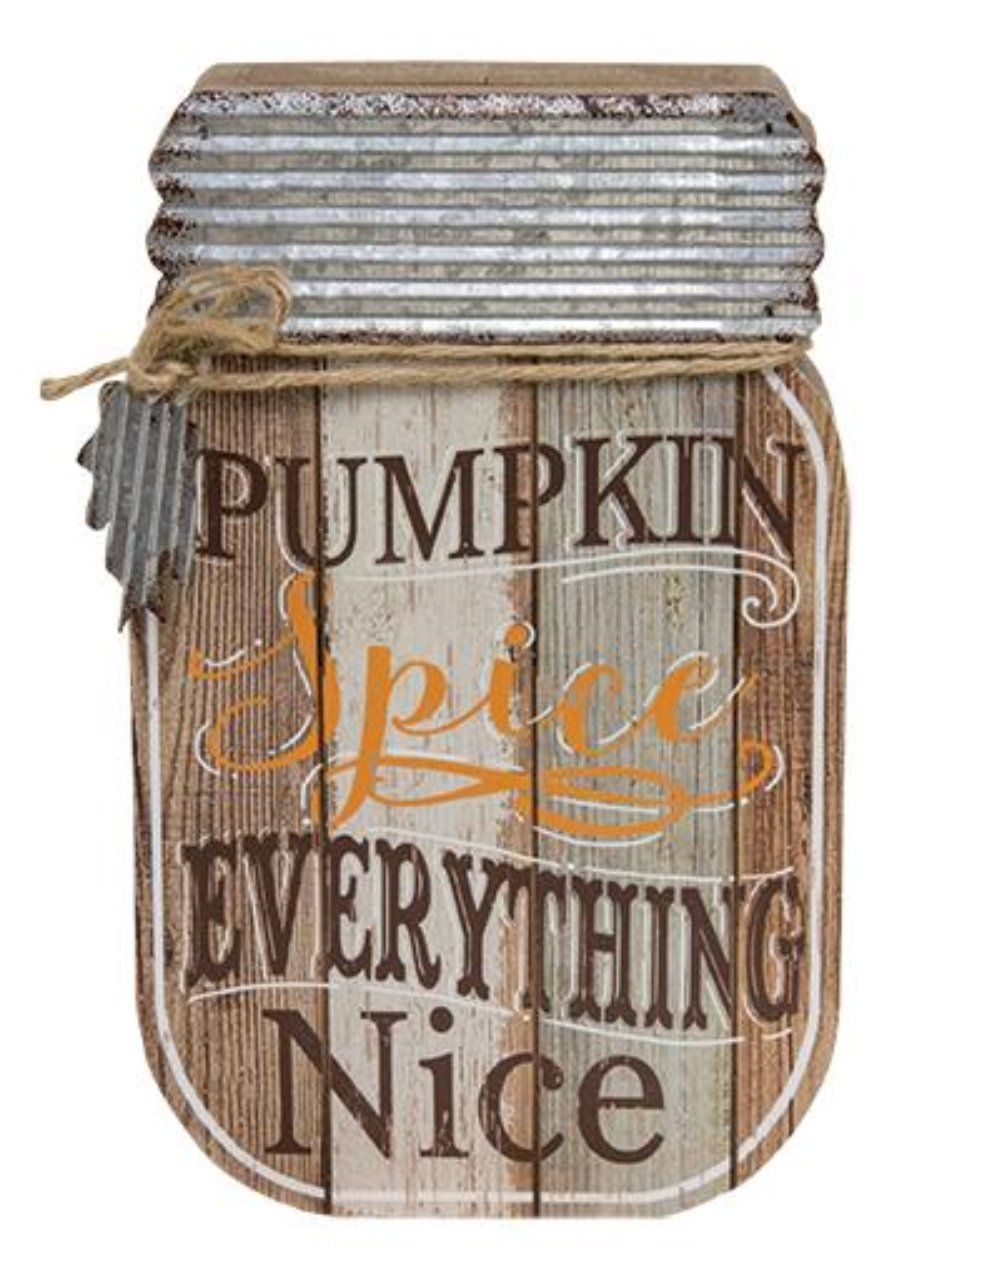 Pumpkin Spice Everything Nice Mason Jar Hanger | Mason jar ...